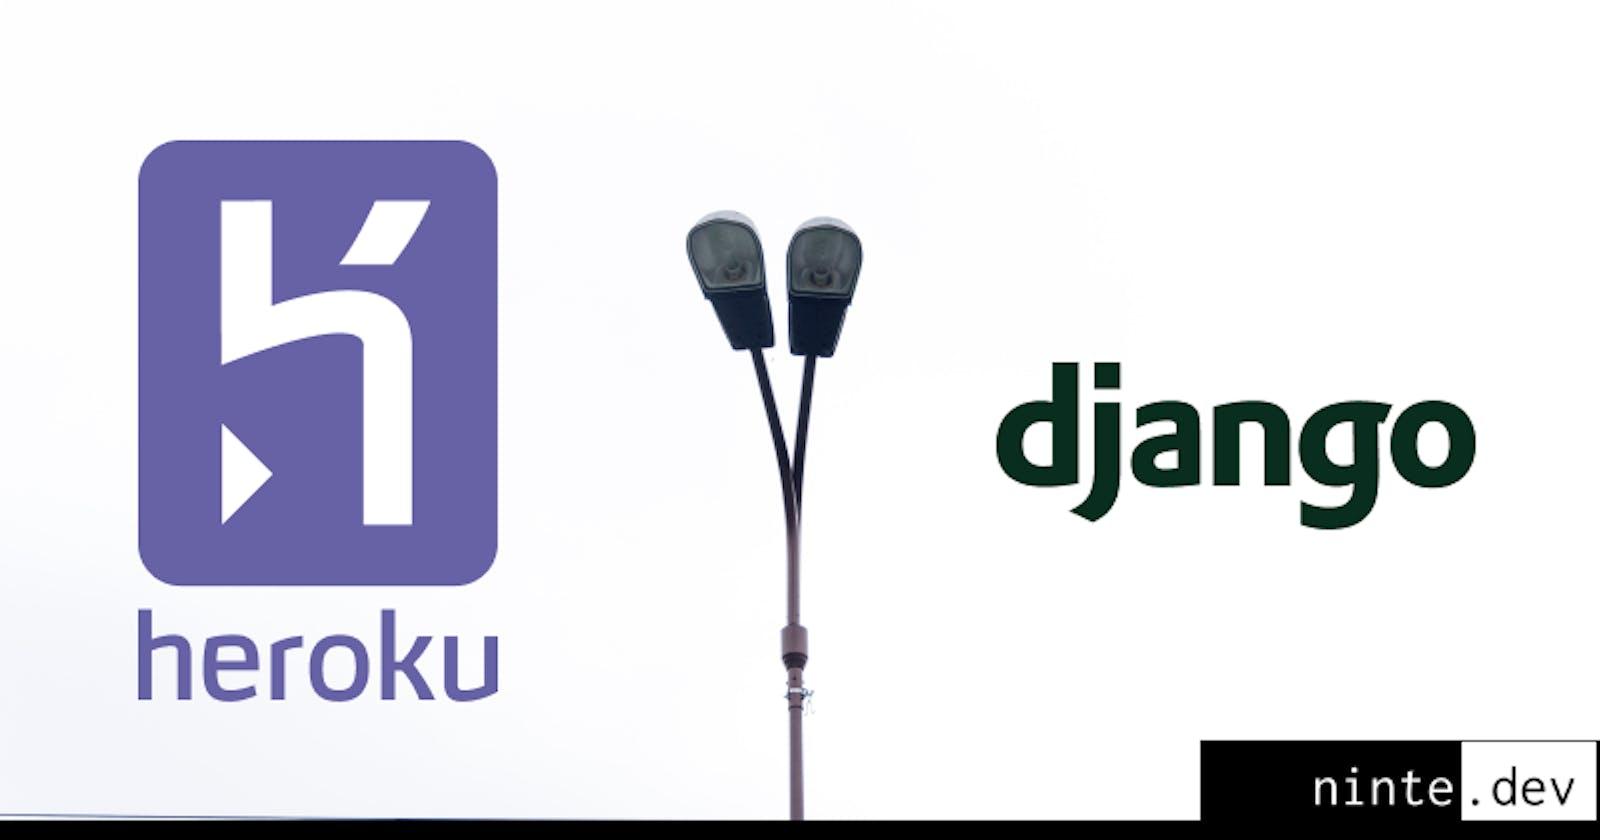 How to deploy a Django web application to Heroku - a comprehensive guide